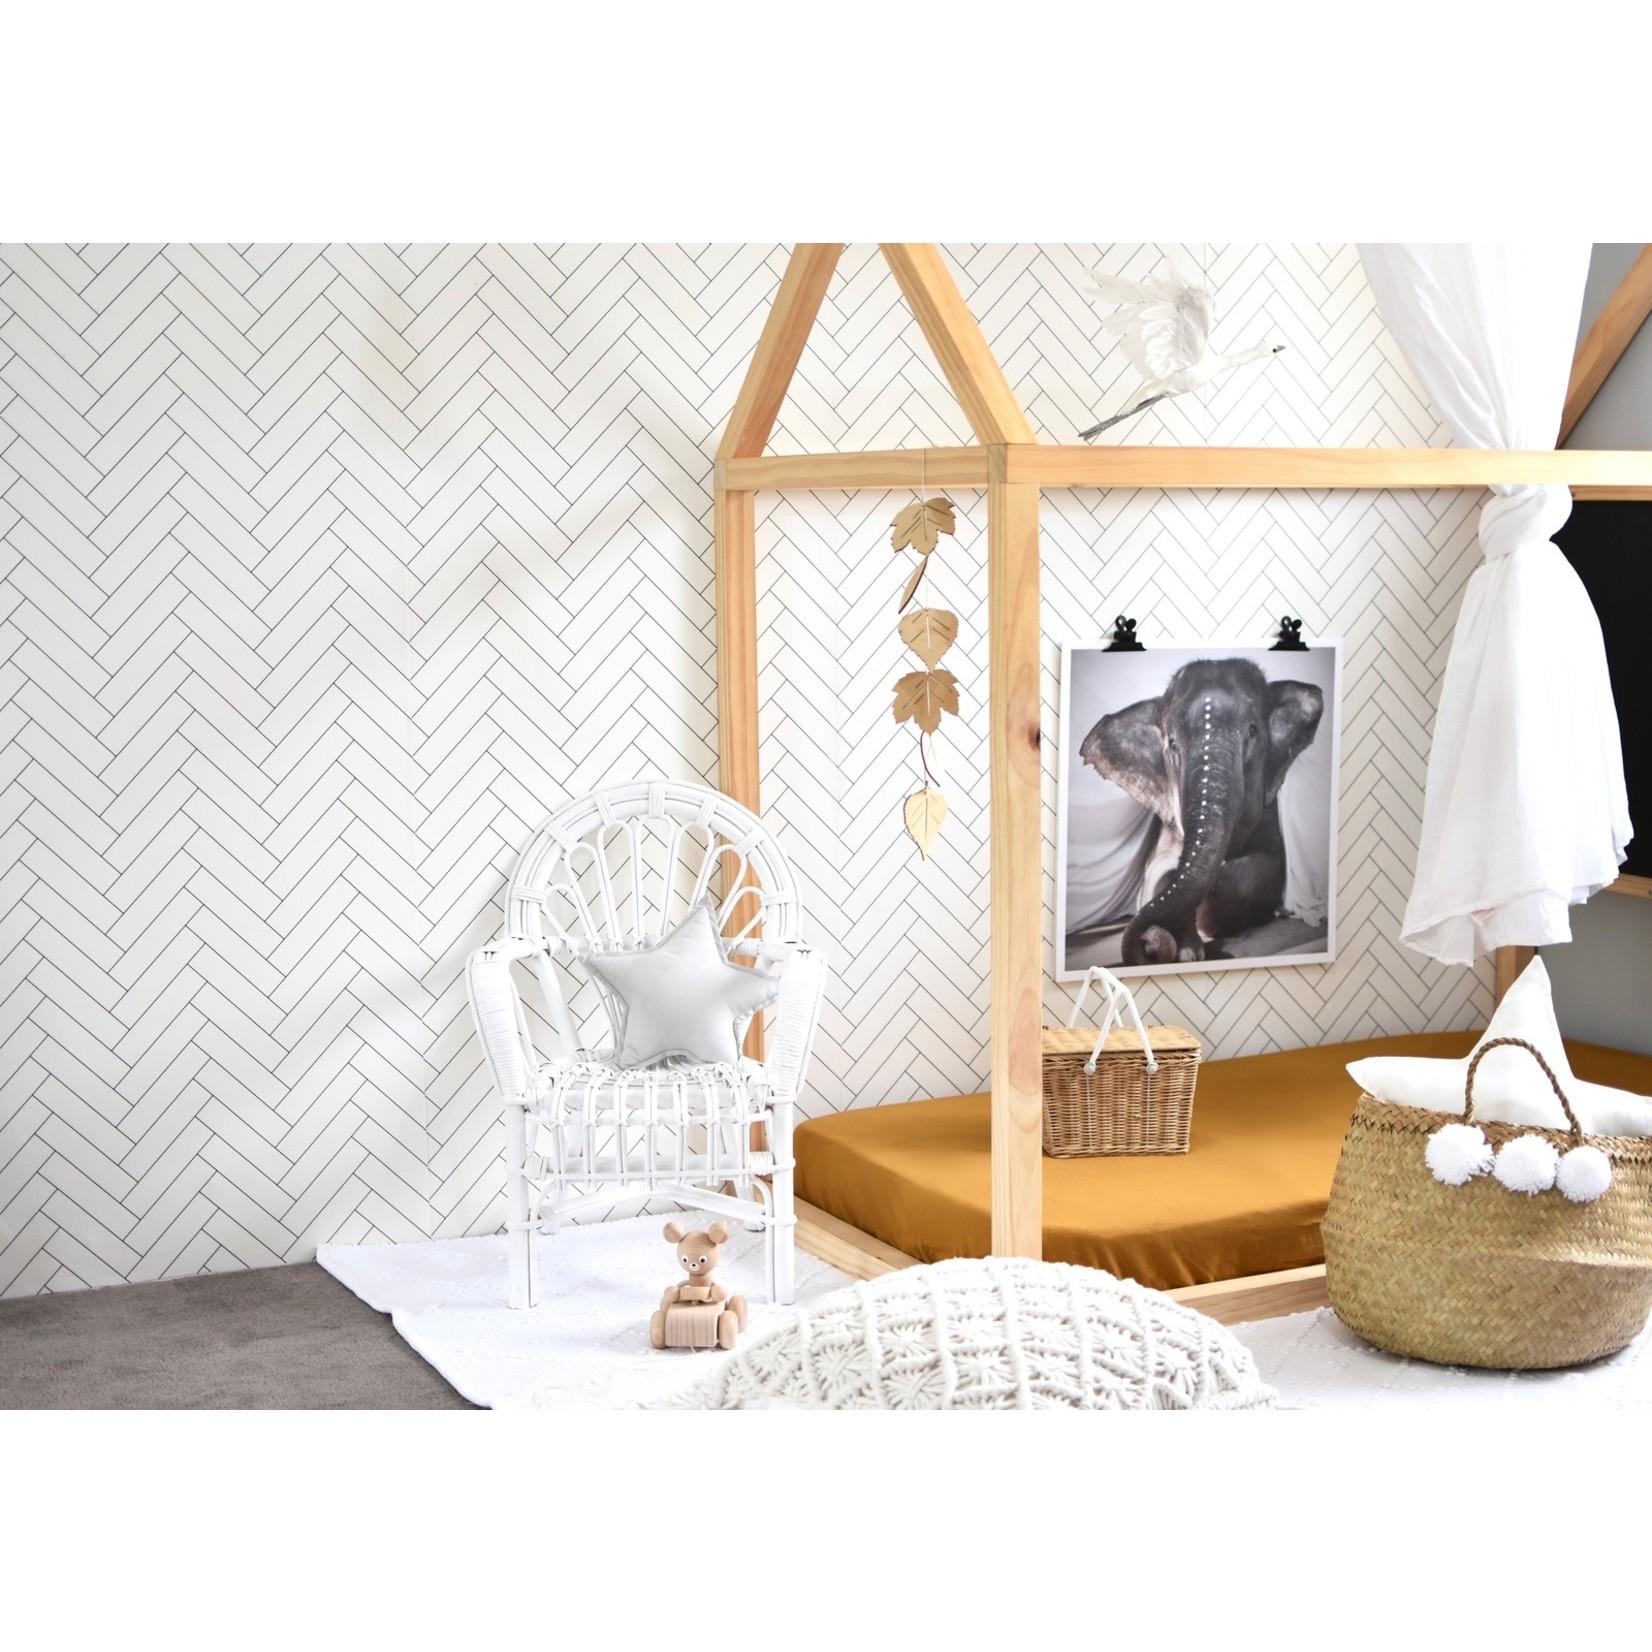 Snuggle Hunny °° Housse de bassinette Ocre